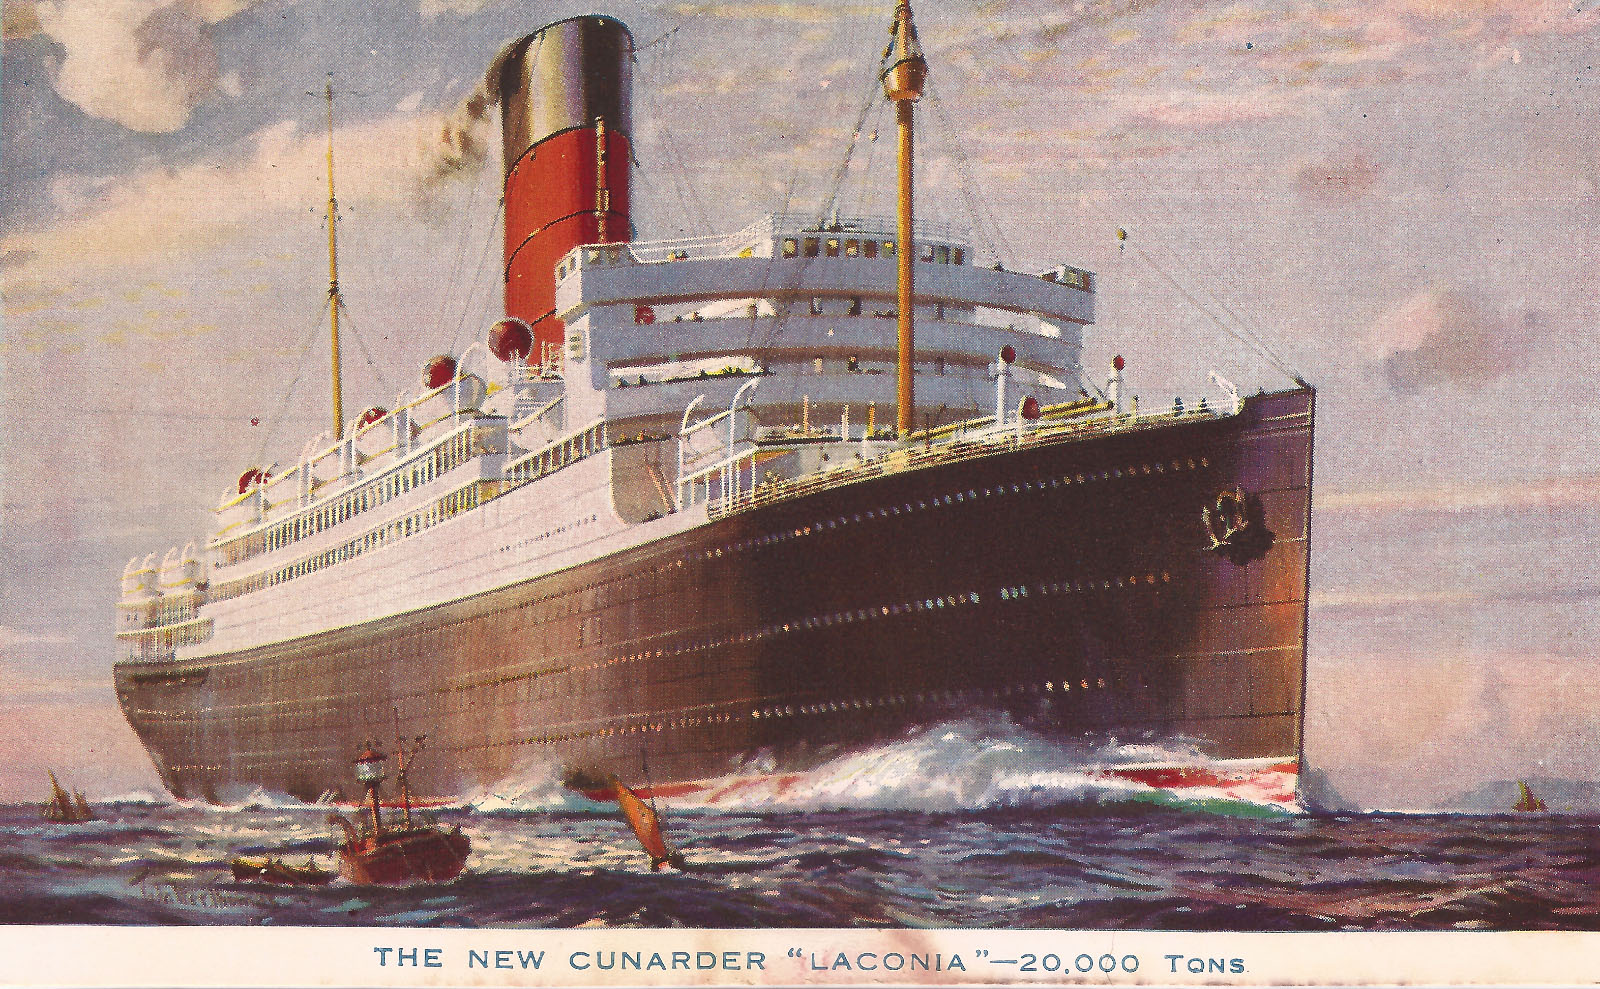 Cruising Around the World on Cunard's Luxury Liner RMS Laconia